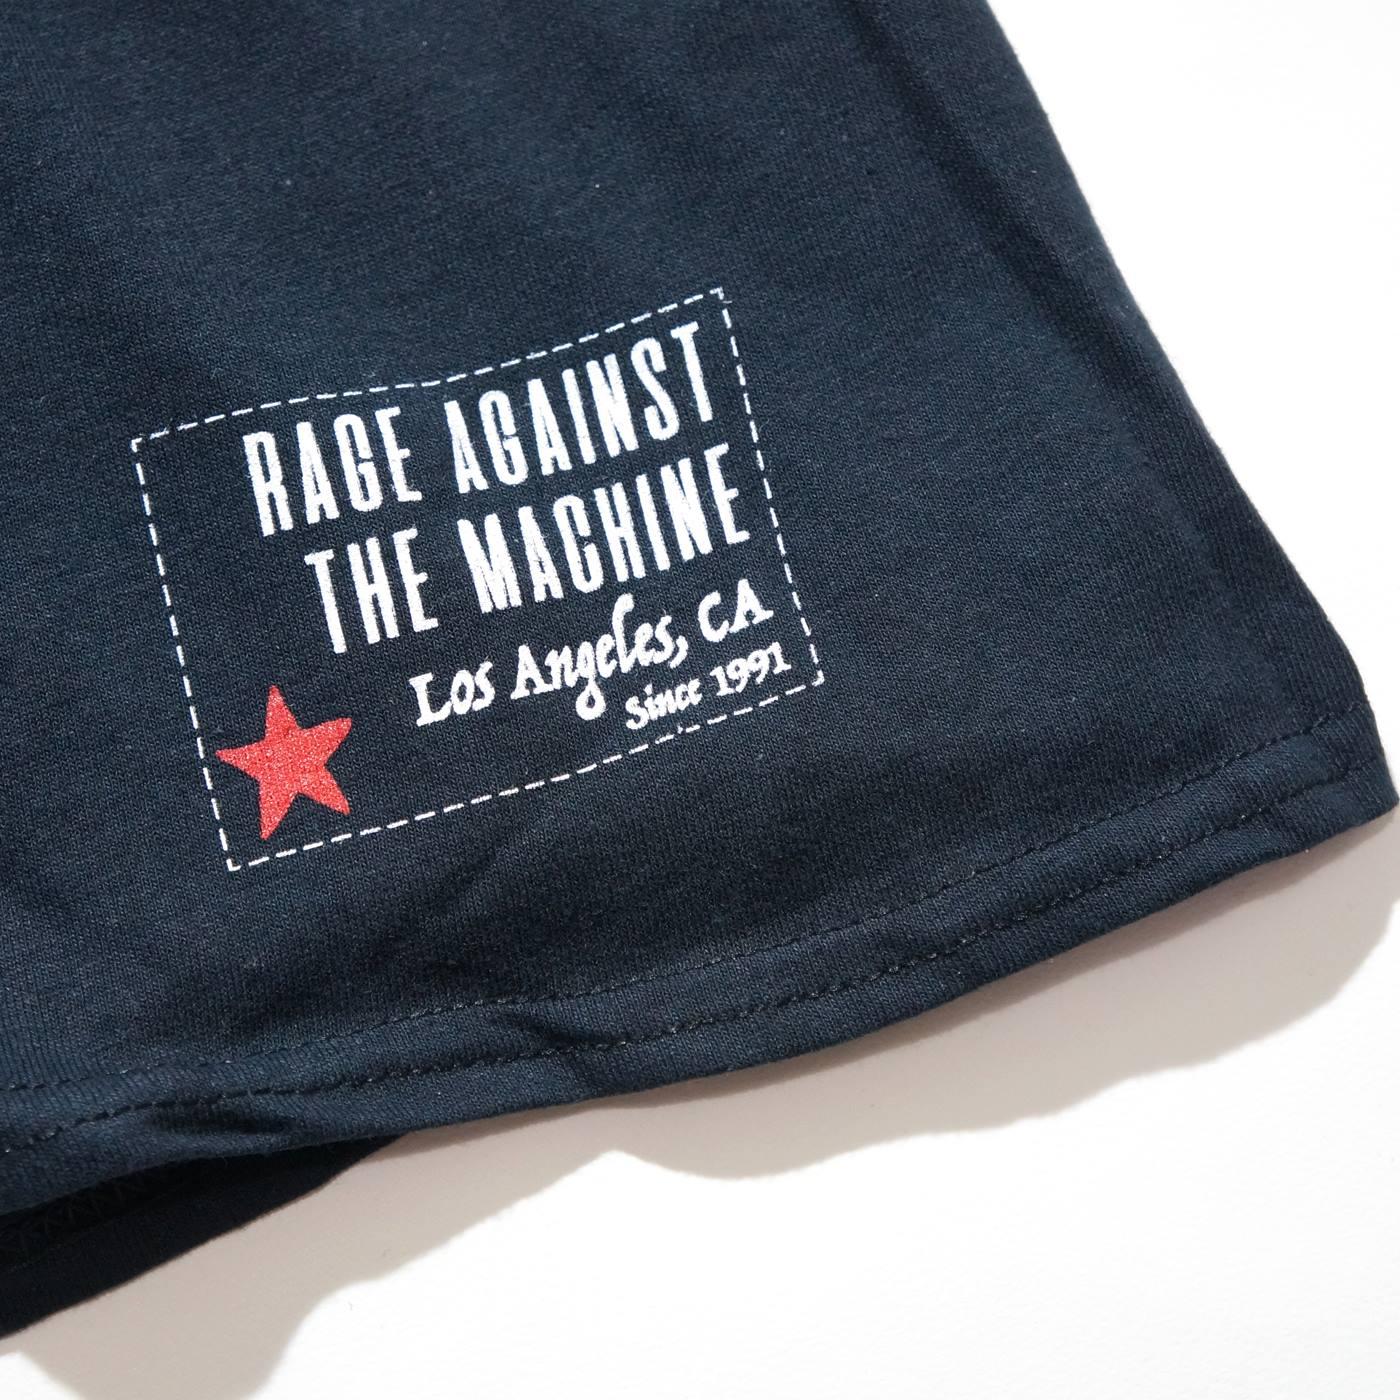 RAGE AGAINST THE MACHINE Tシャツ Battle 99-Black